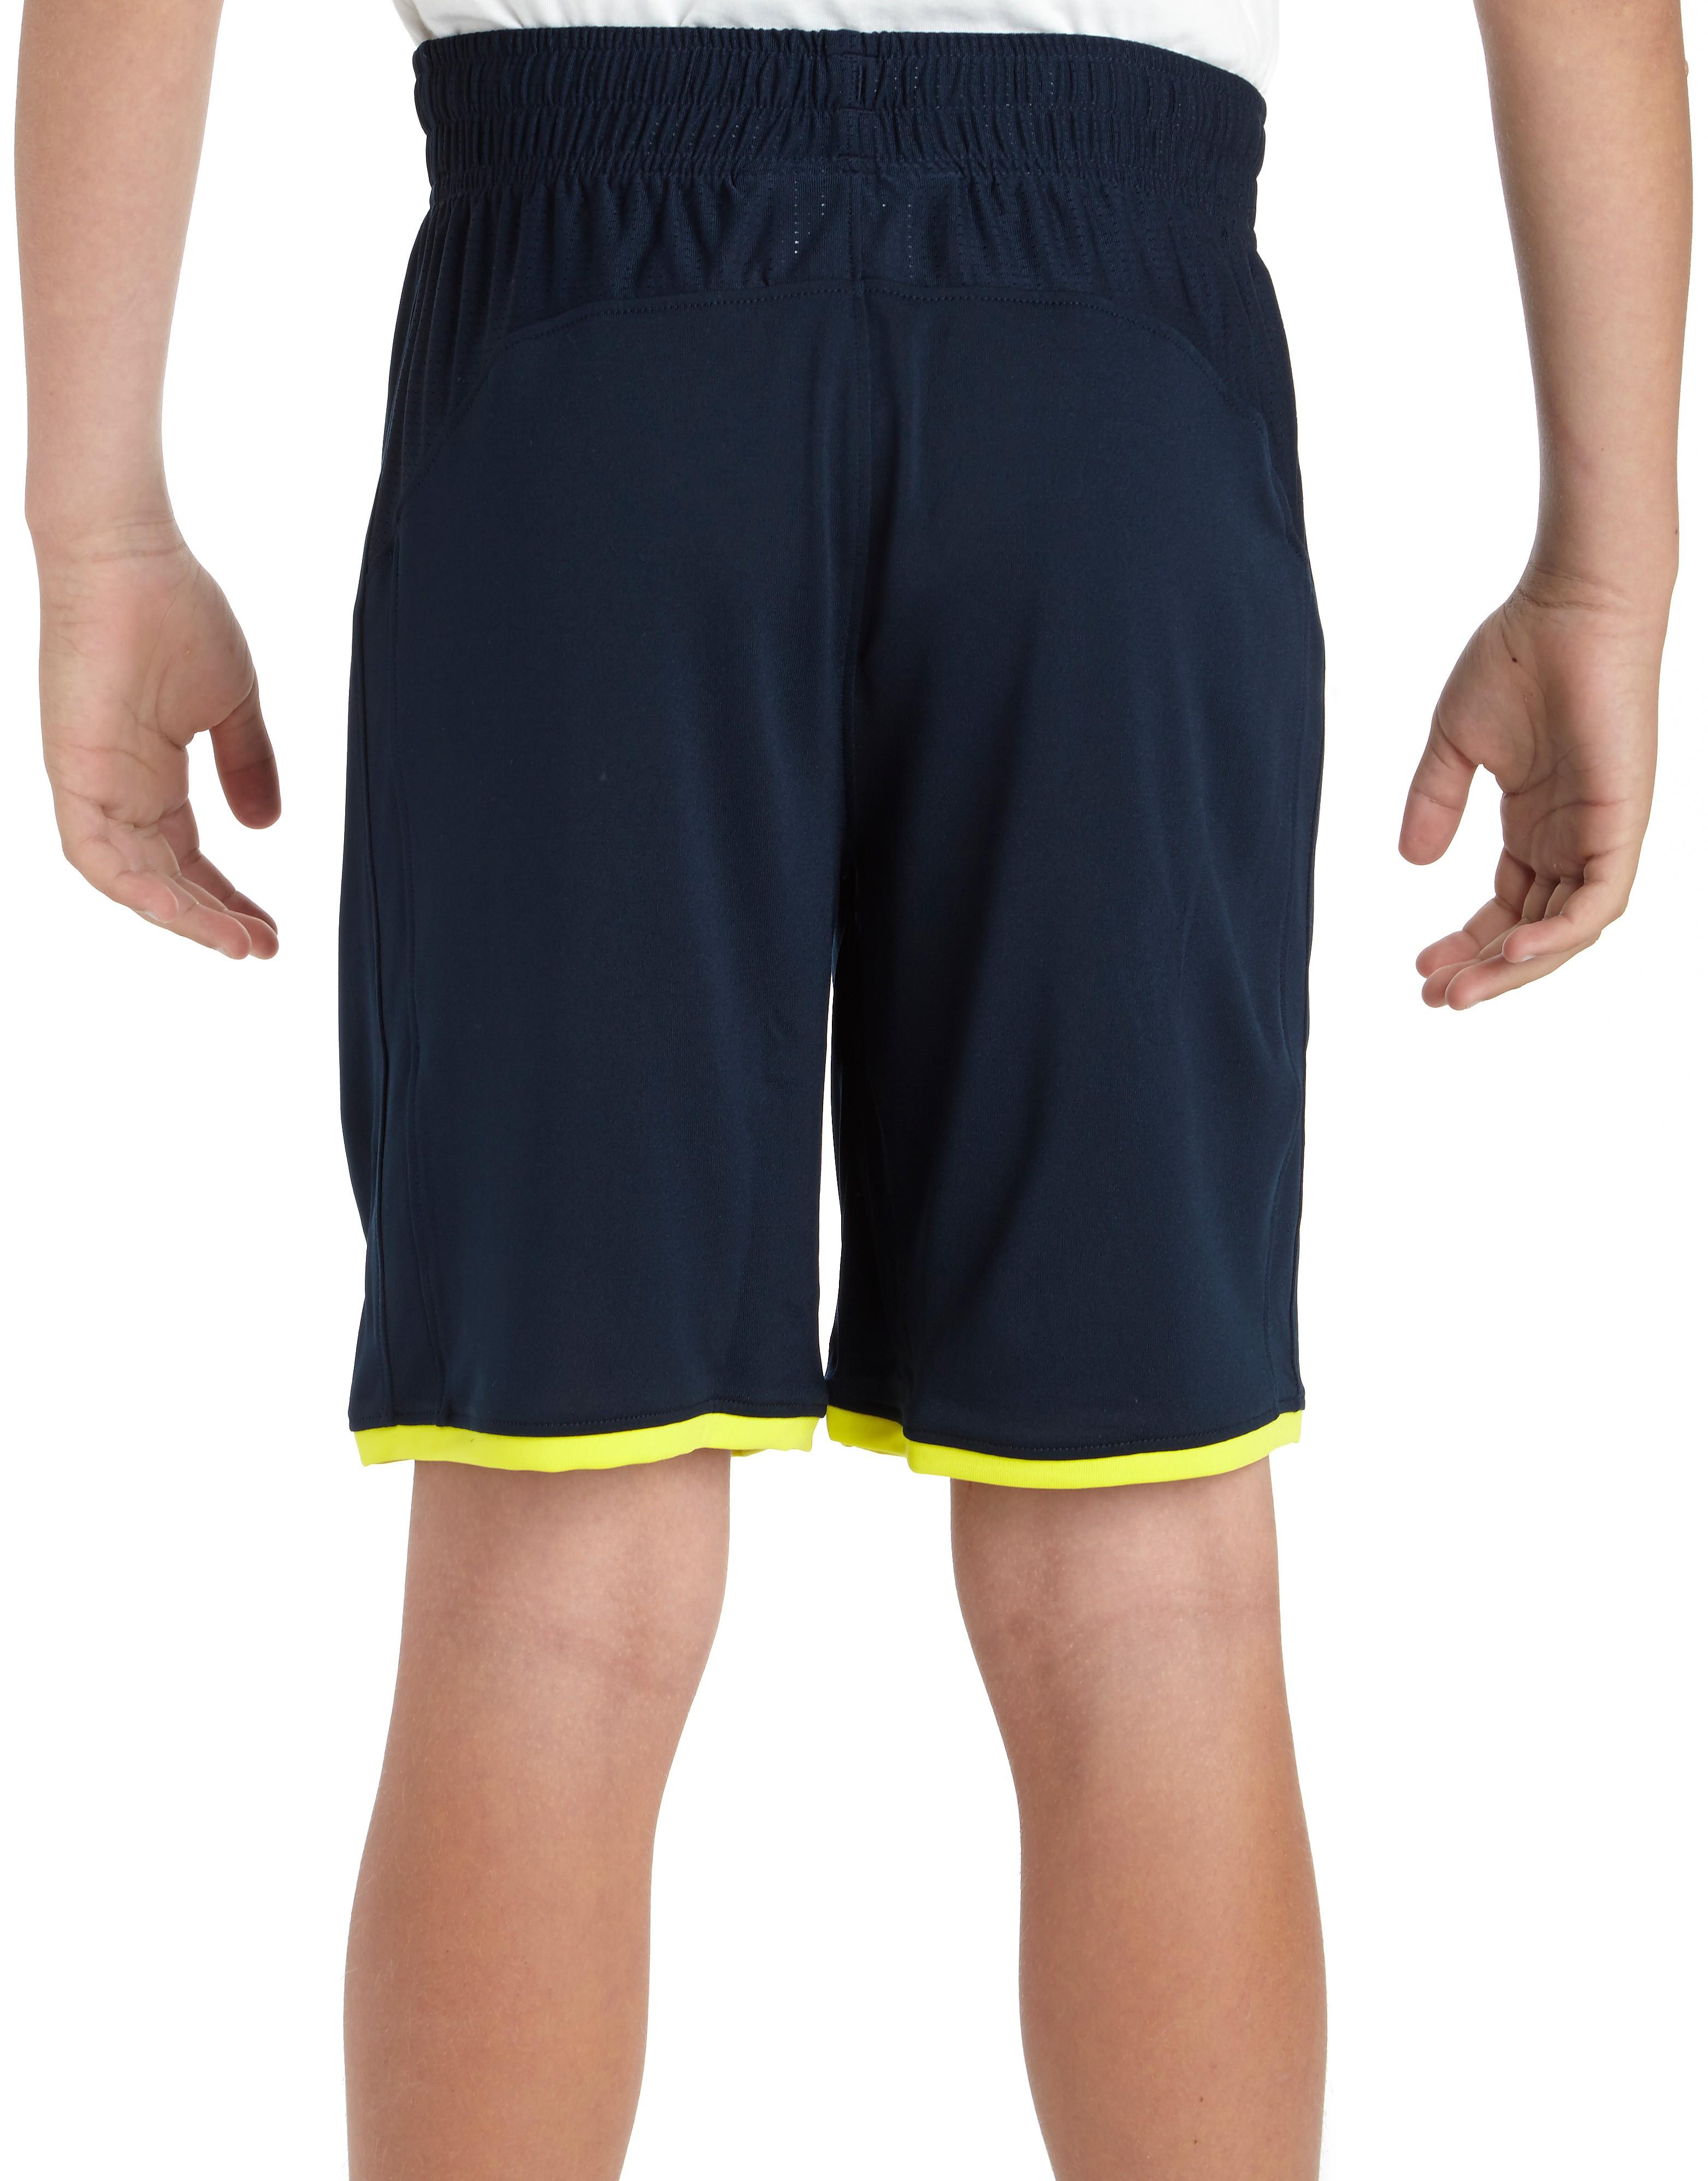 Under Armour Tottenham Hotspur 2014 Junior Home Shorts